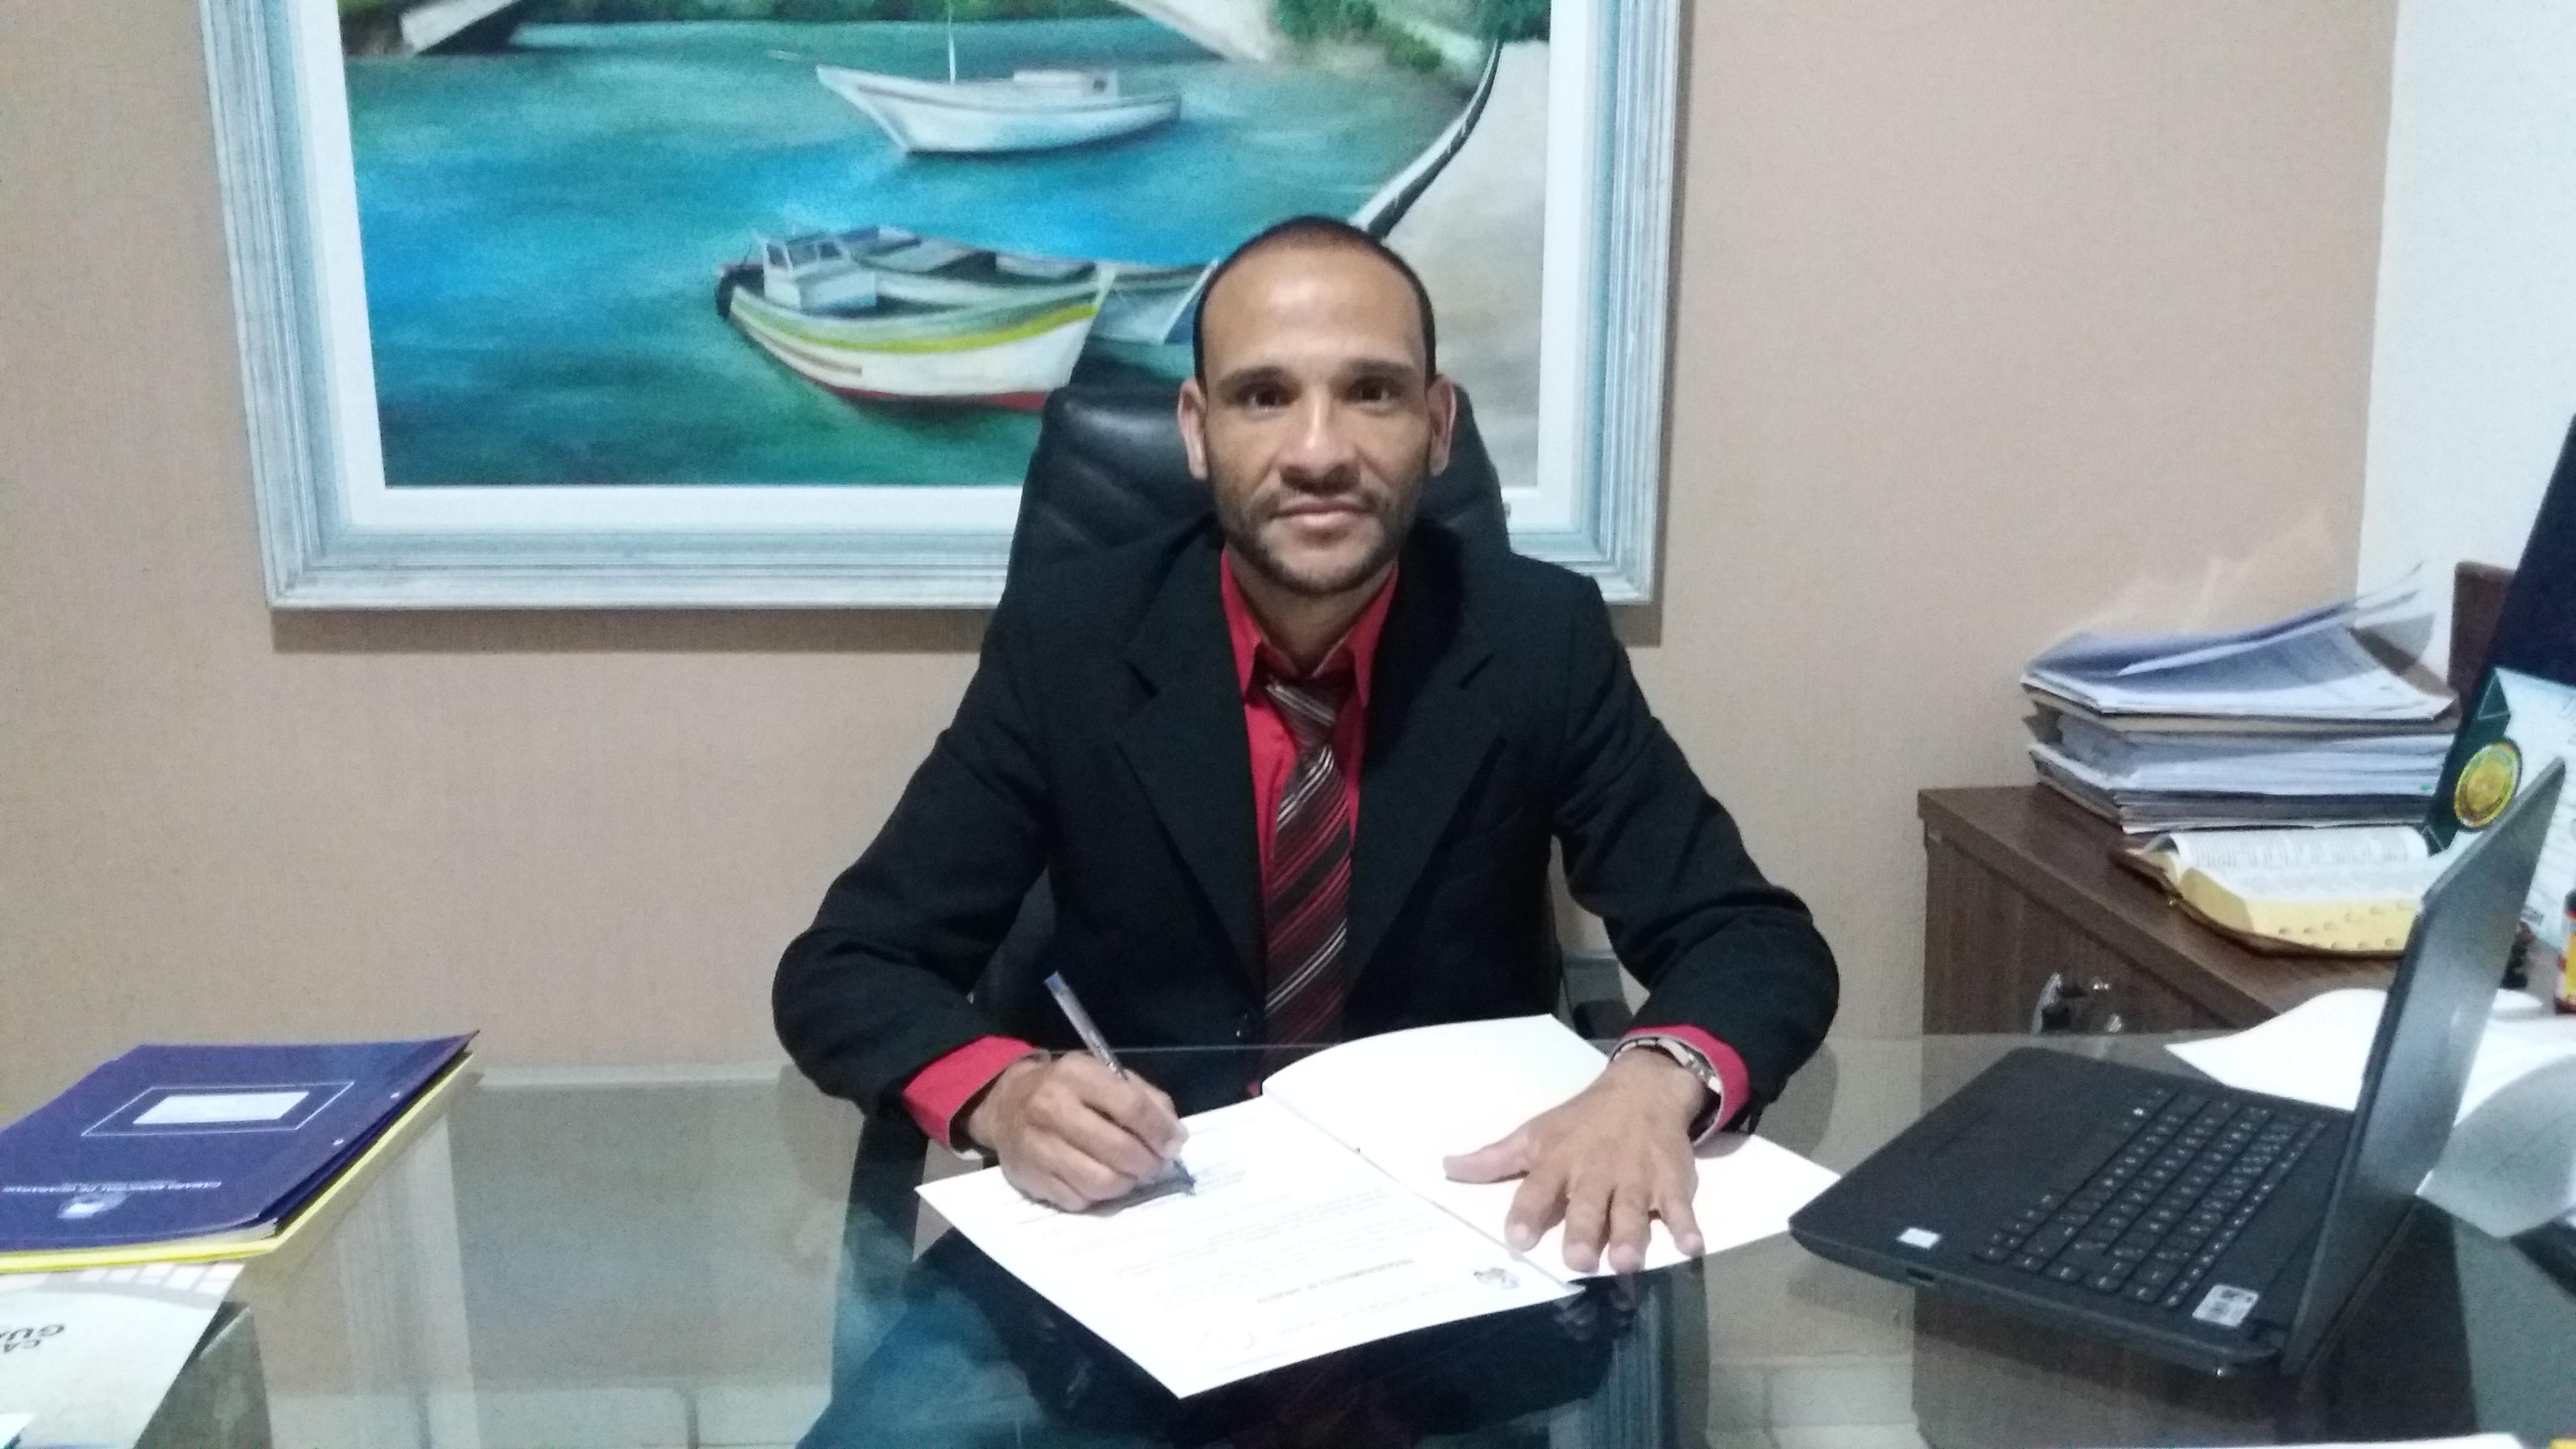 Presidente anuncia aumento de 4,67% para todos os servidores da Câmara de Guarapari